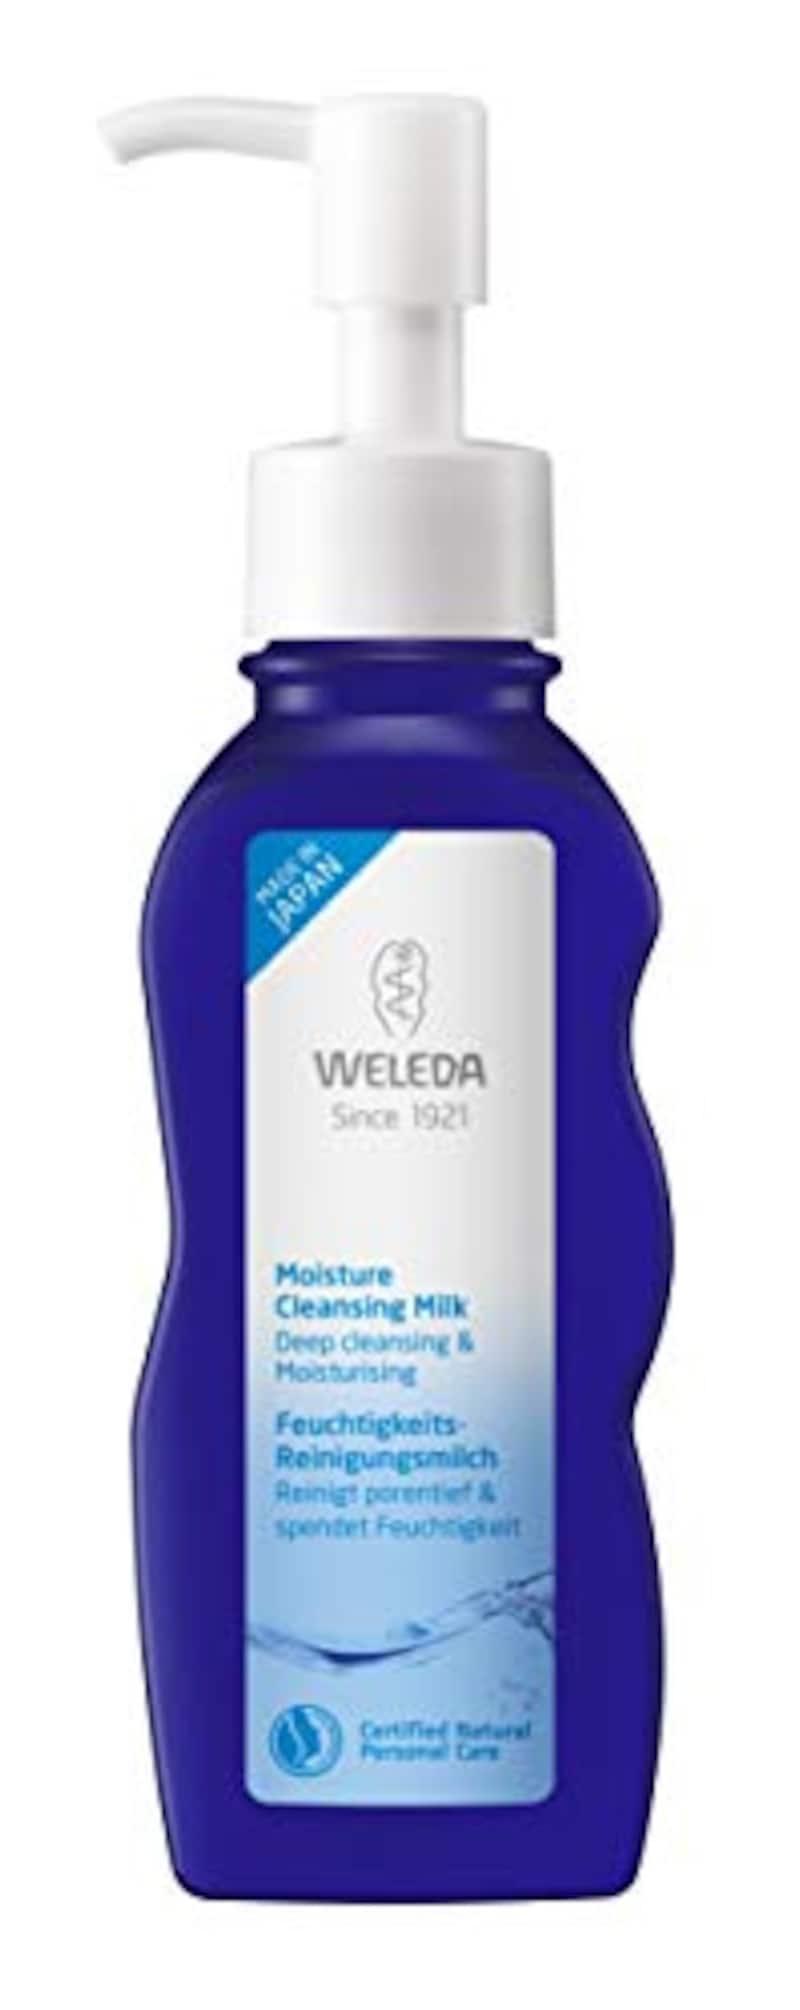 WELEDA(ヴェレダ),モイスチャークレンジングミルク